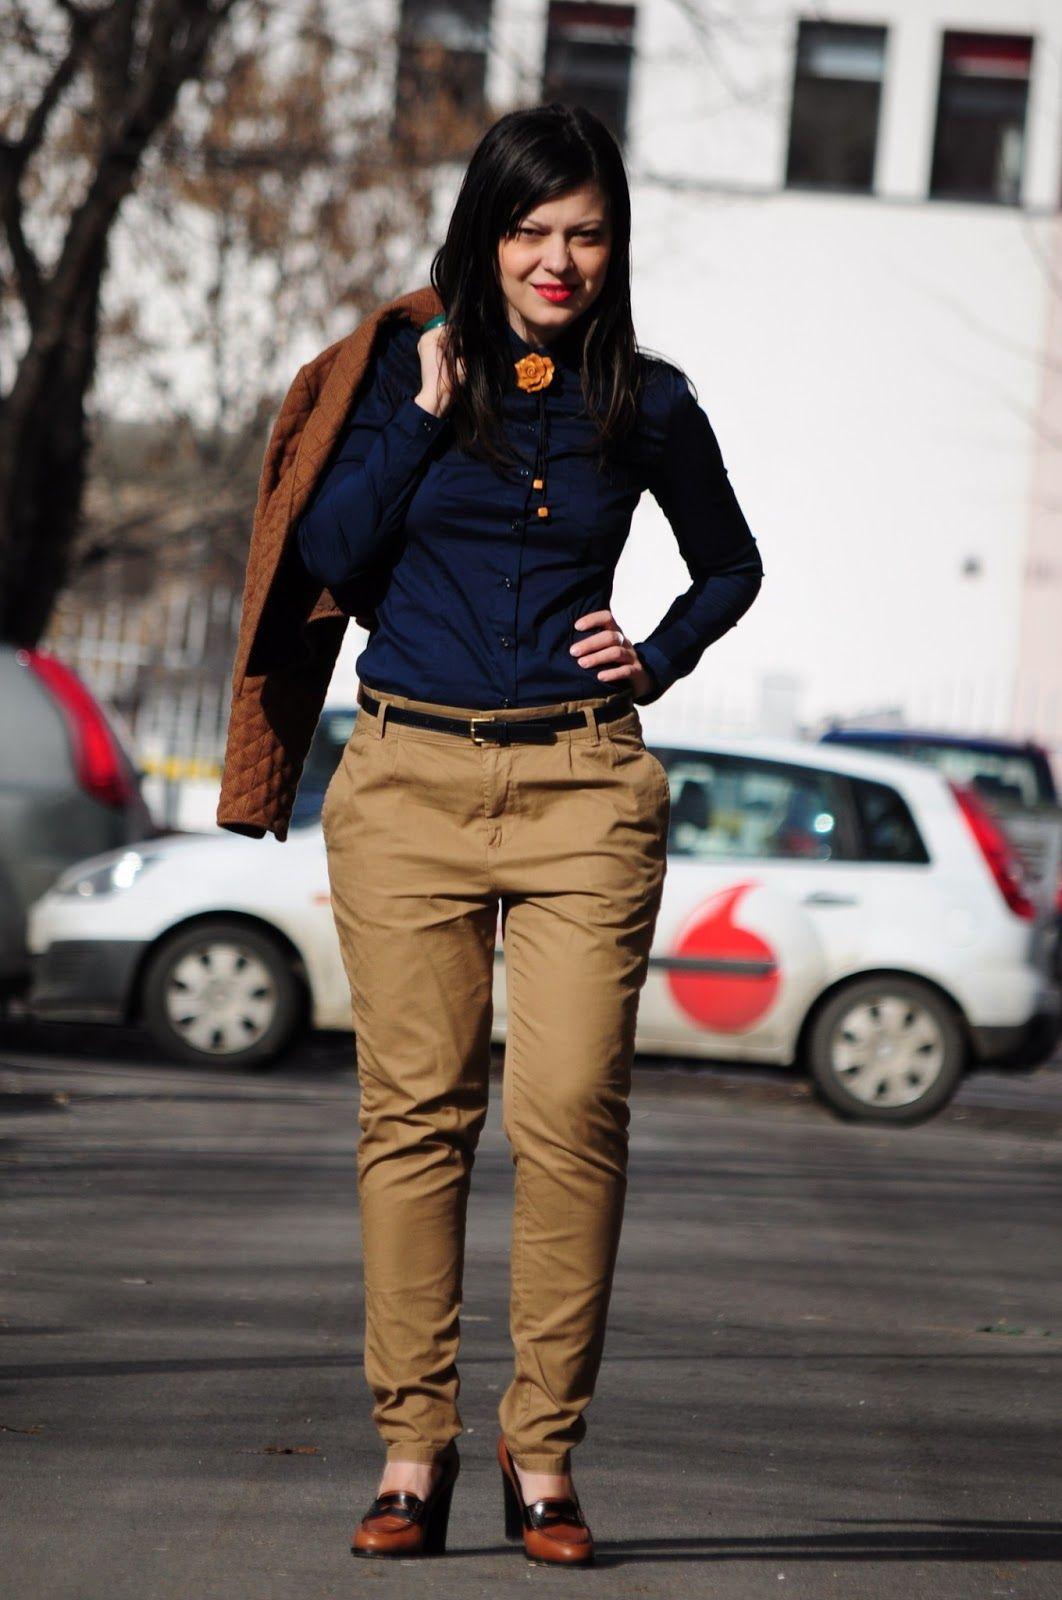 Brown Khaki Pants What Color Shirt